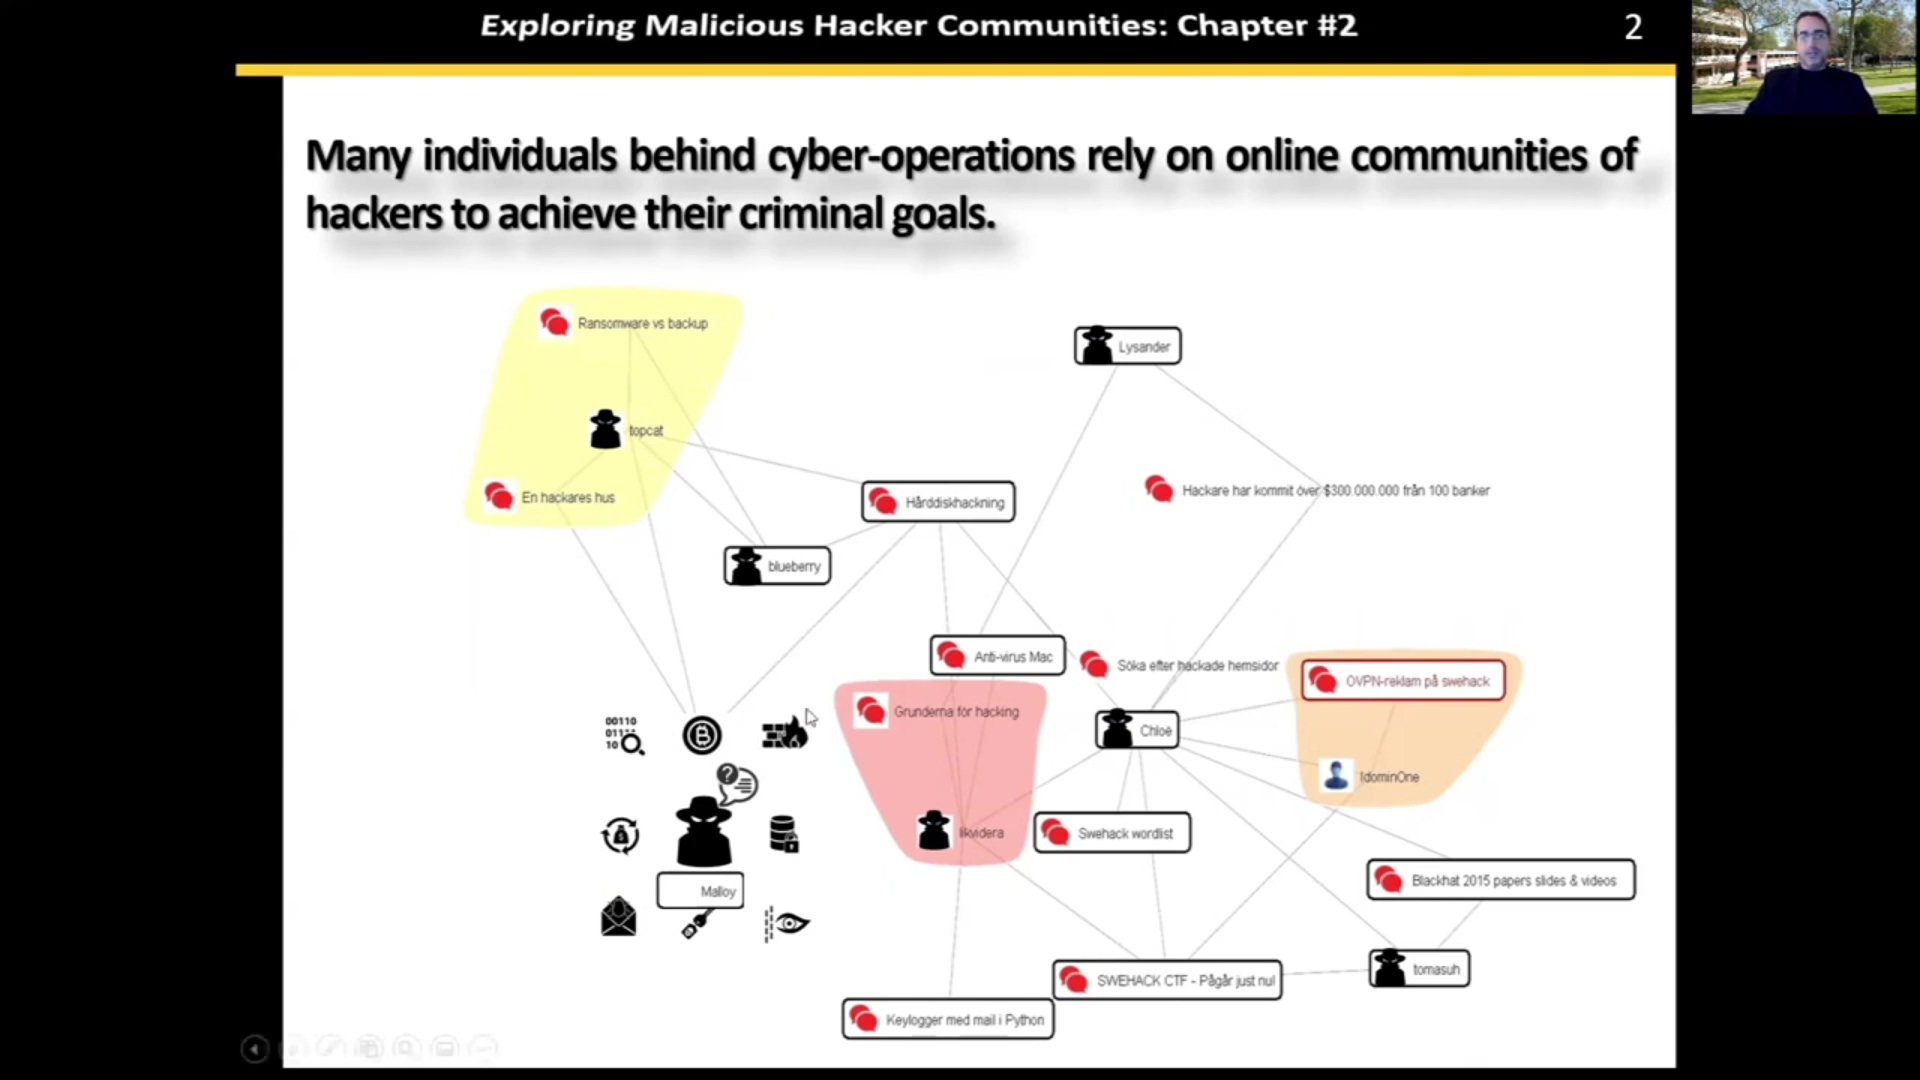 Exploring Malicious Hacker Communities Background